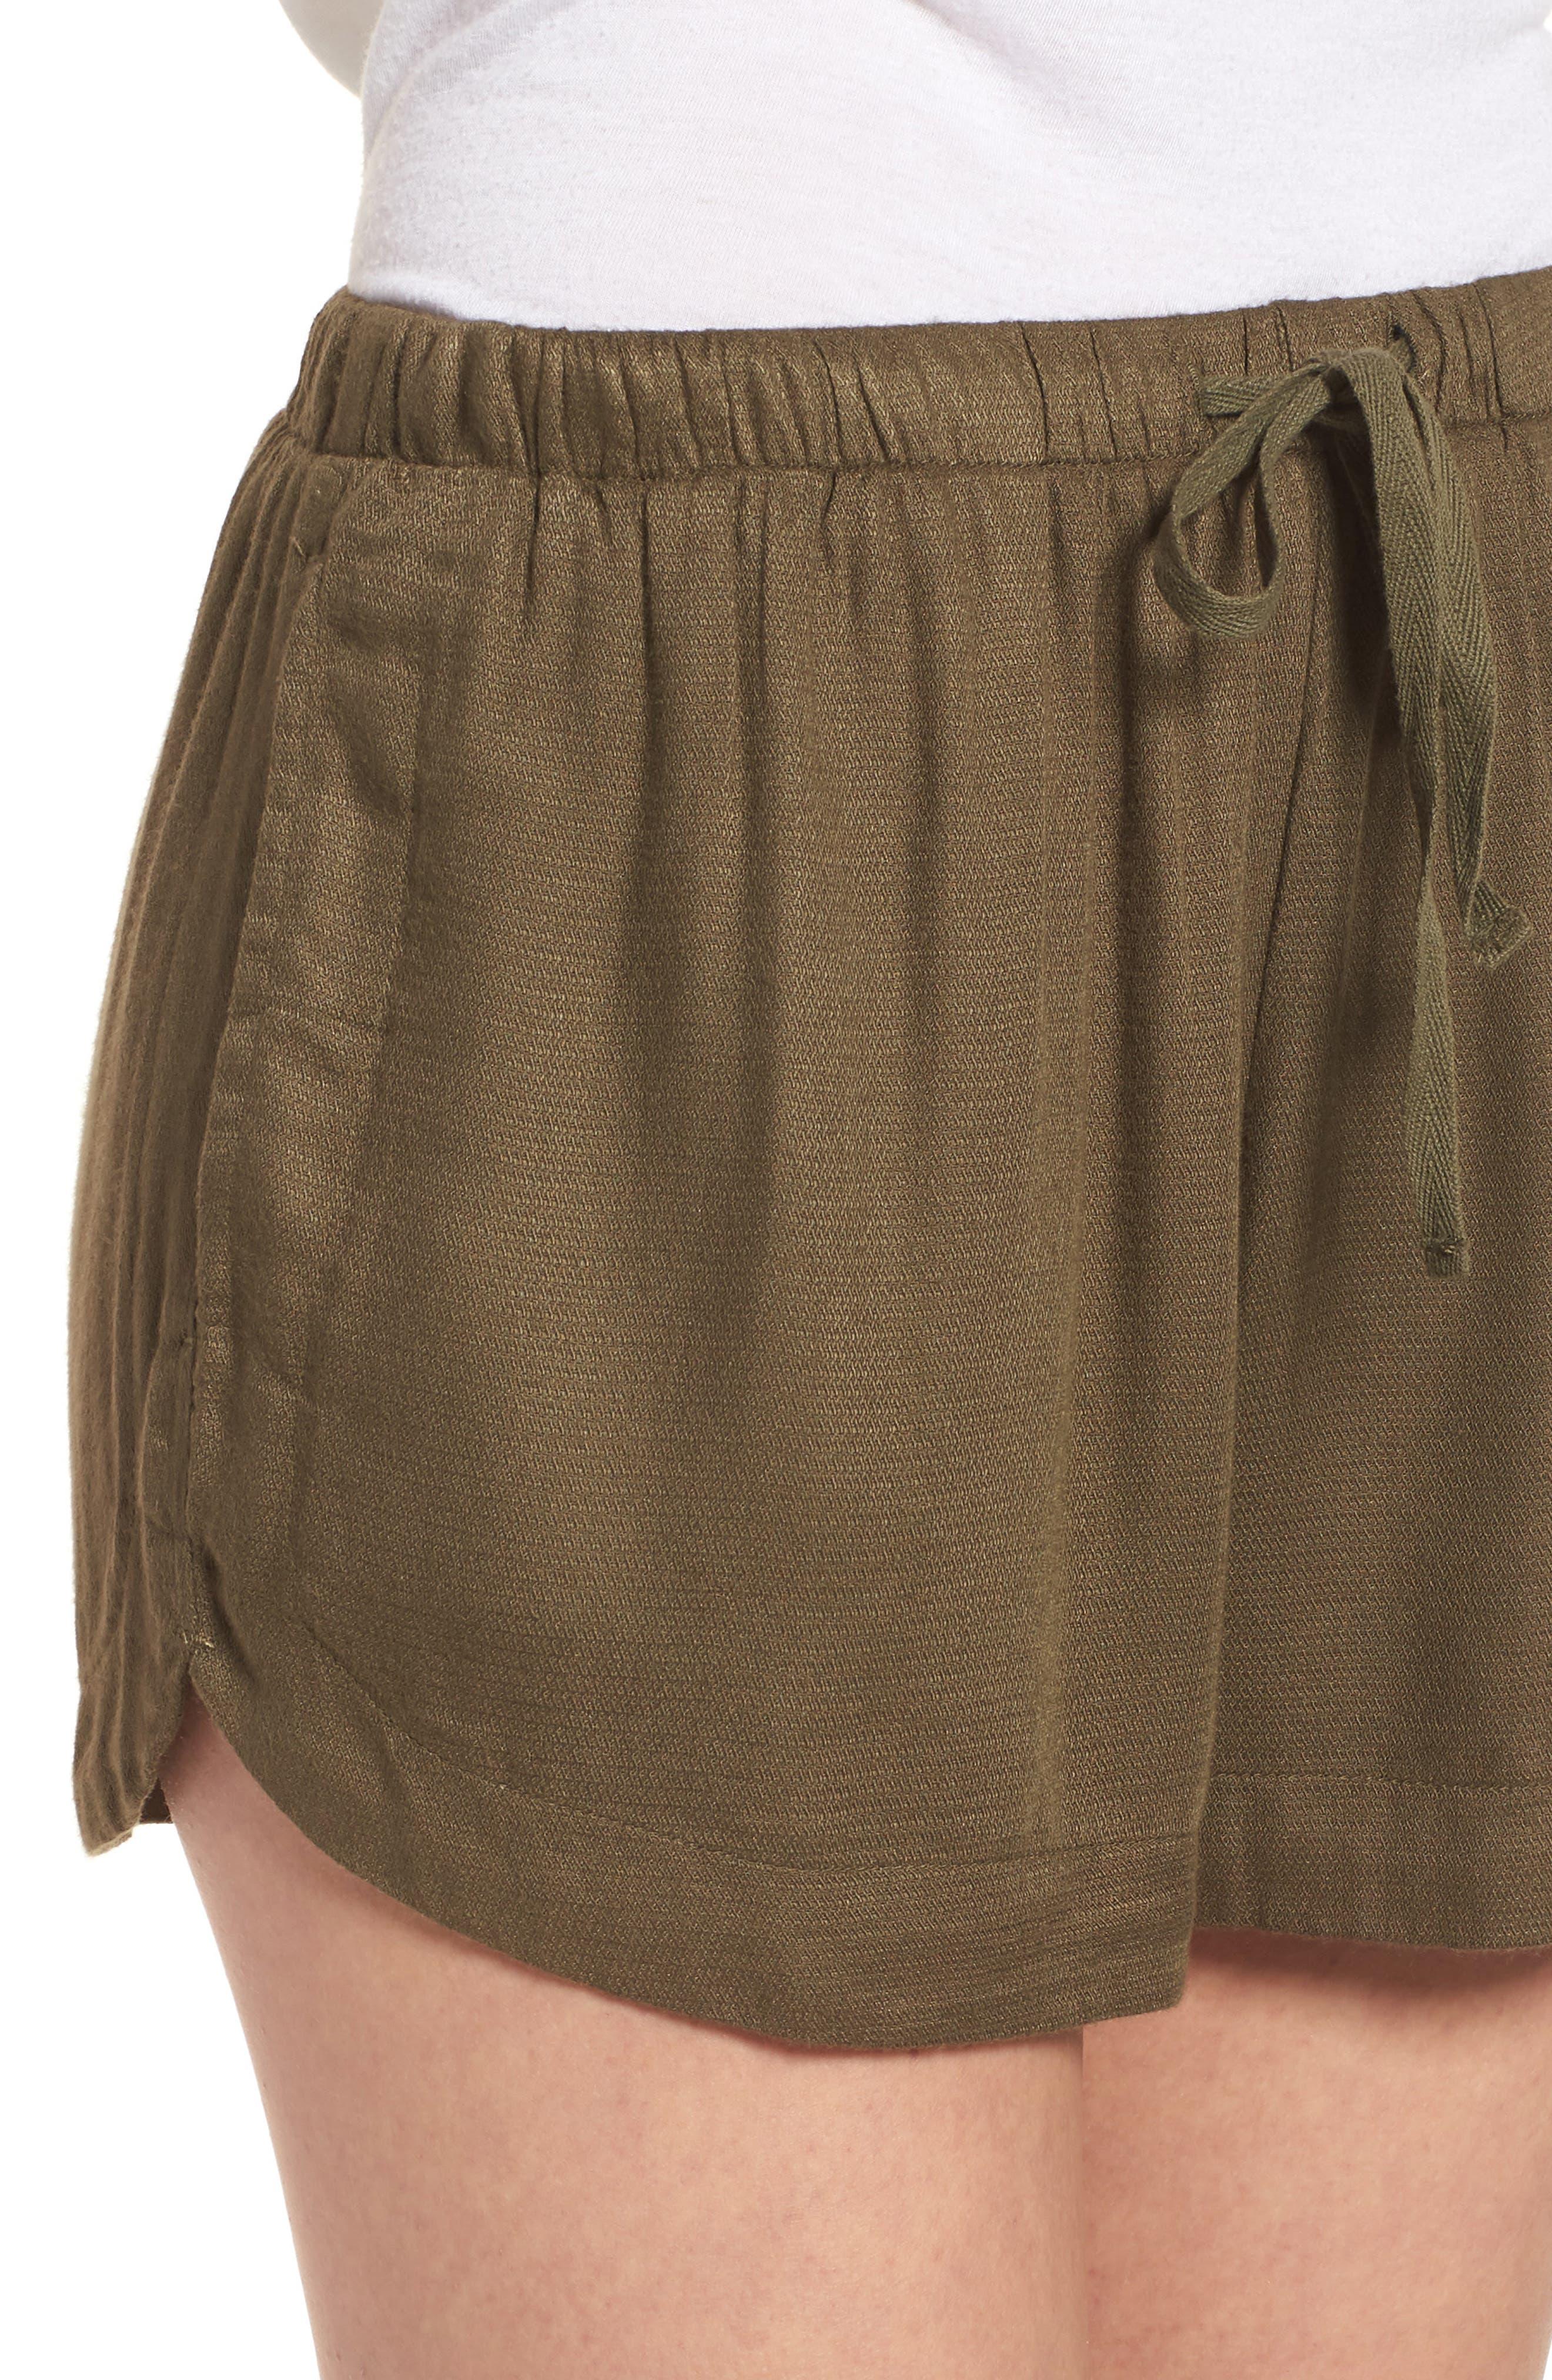 Vary Yume Shorts,                             Alternate thumbnail 4, color,                             340